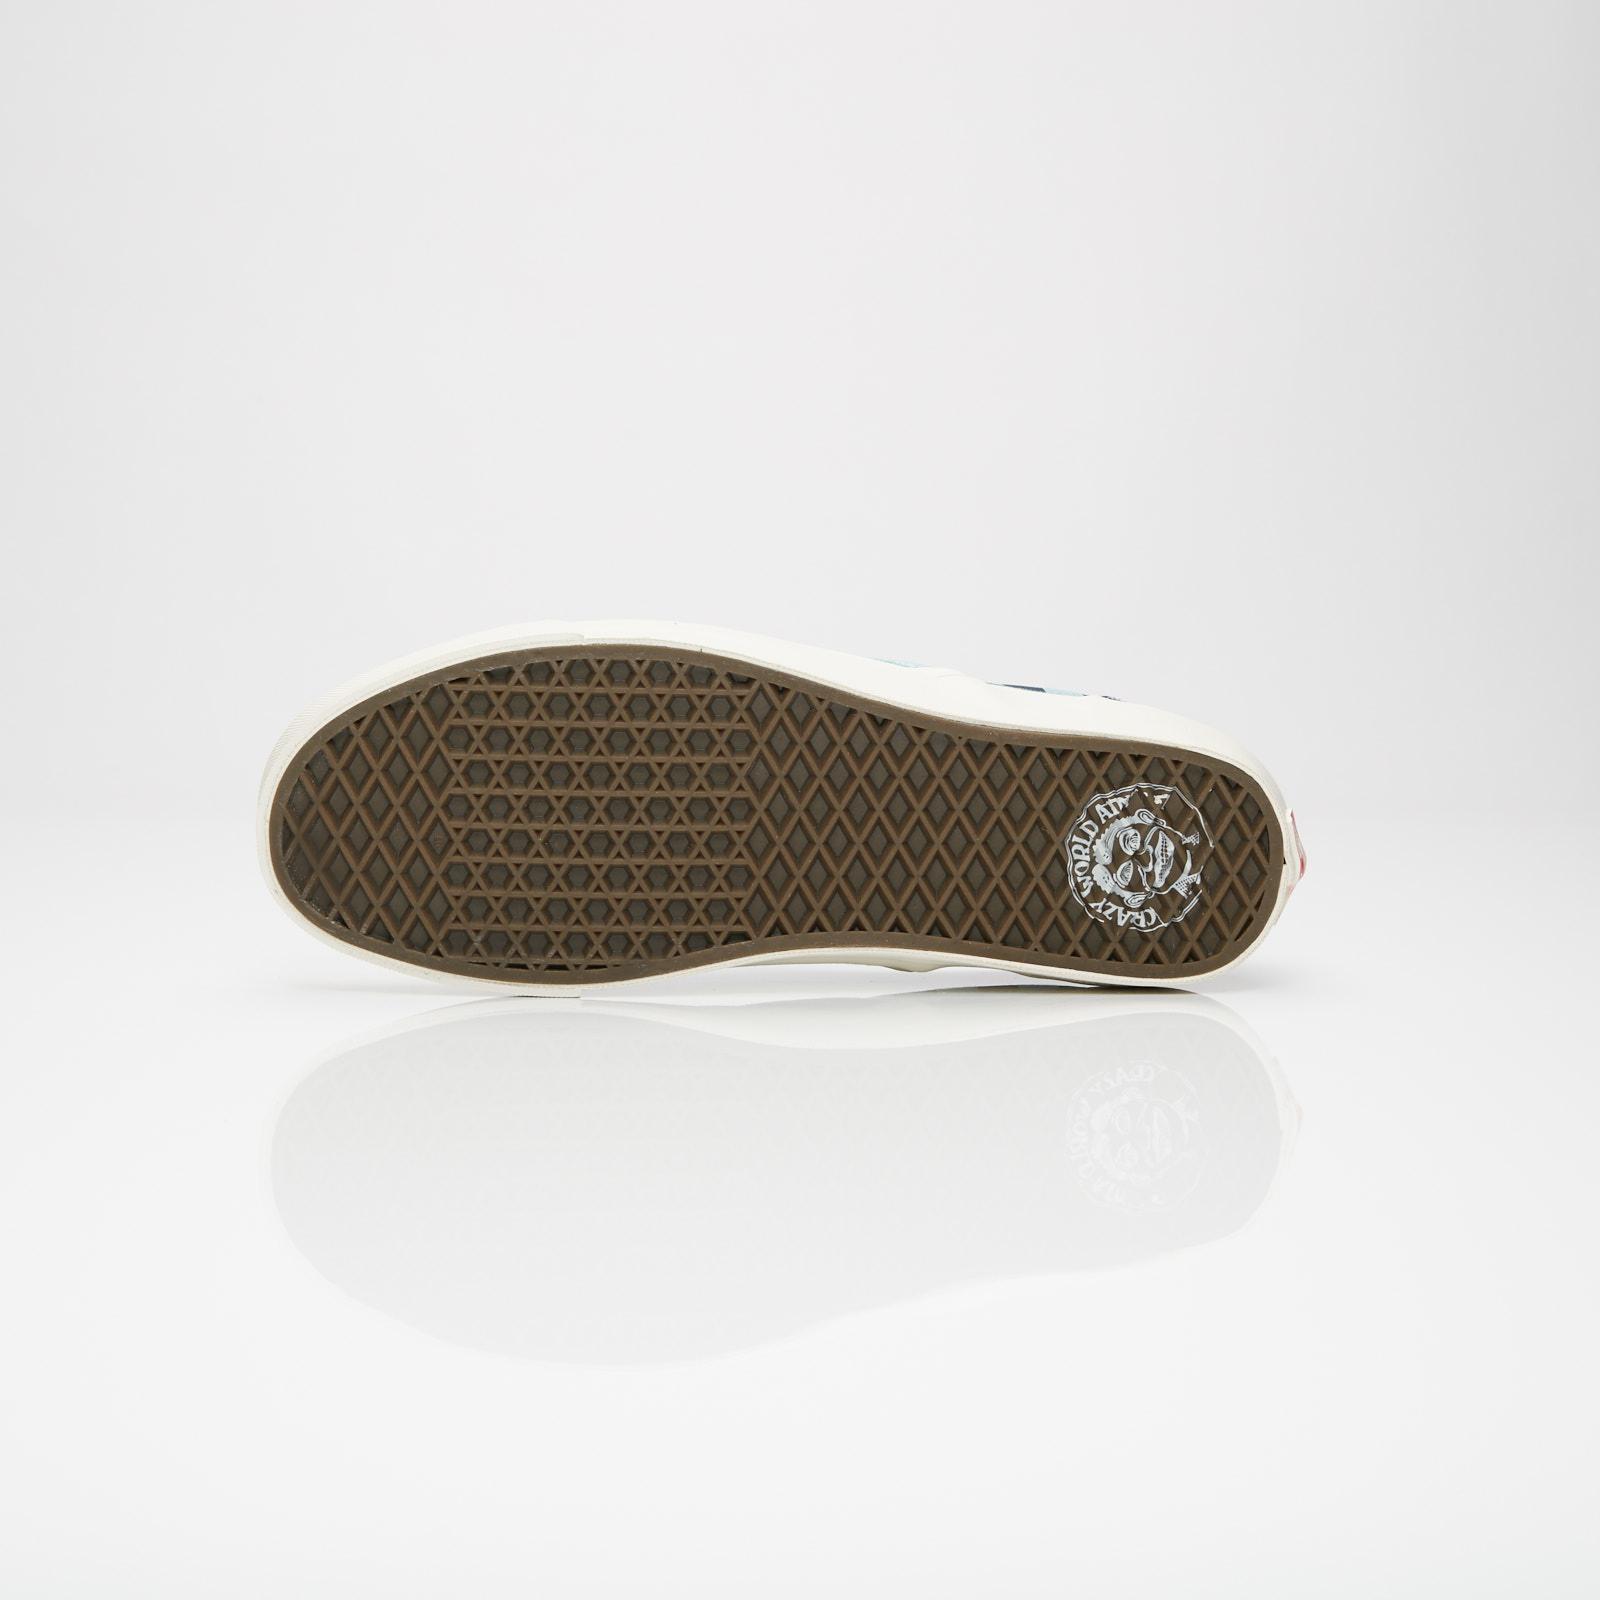 d21cb76c884b38 Vans UA OG Classic Slip-On LX - V00udfqlv - Sneakersnstuff | sneakers &  streetwear online since 1999